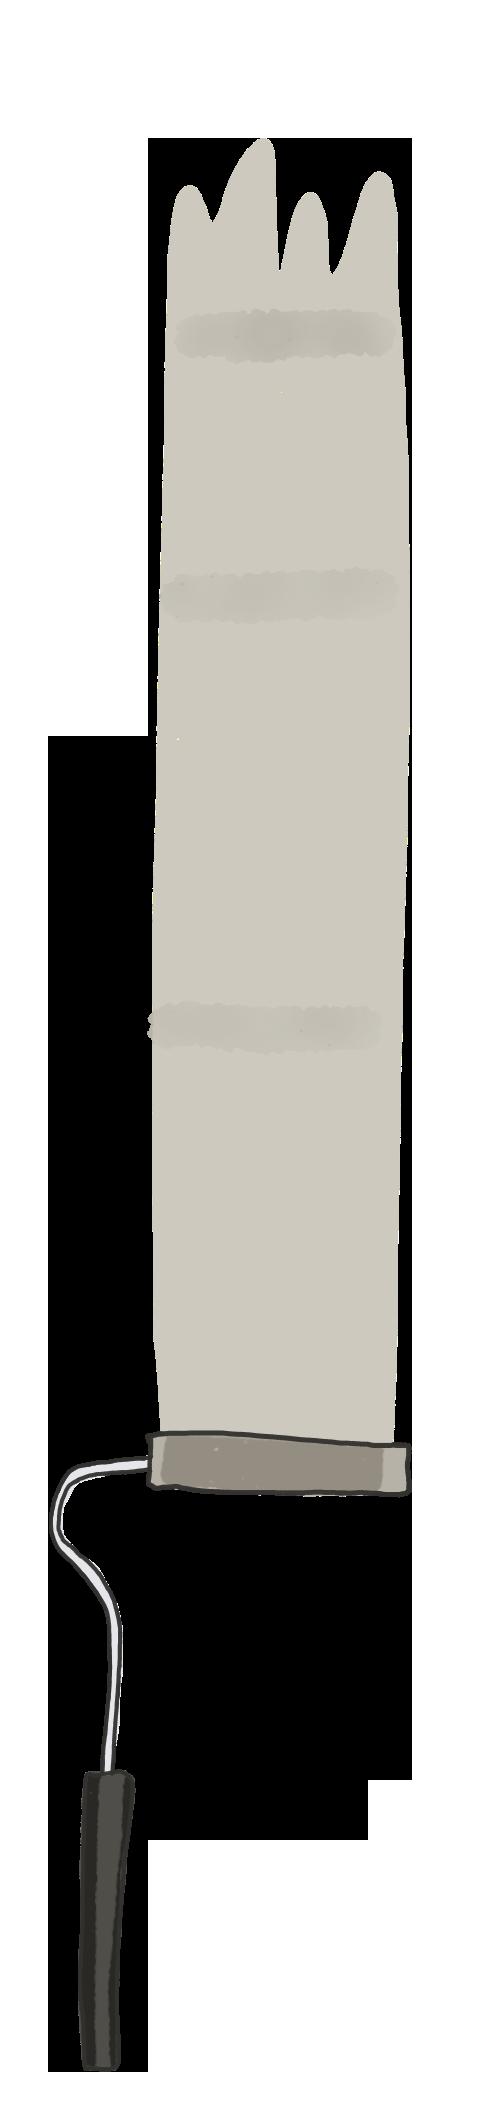 paint-roller-vertical.png